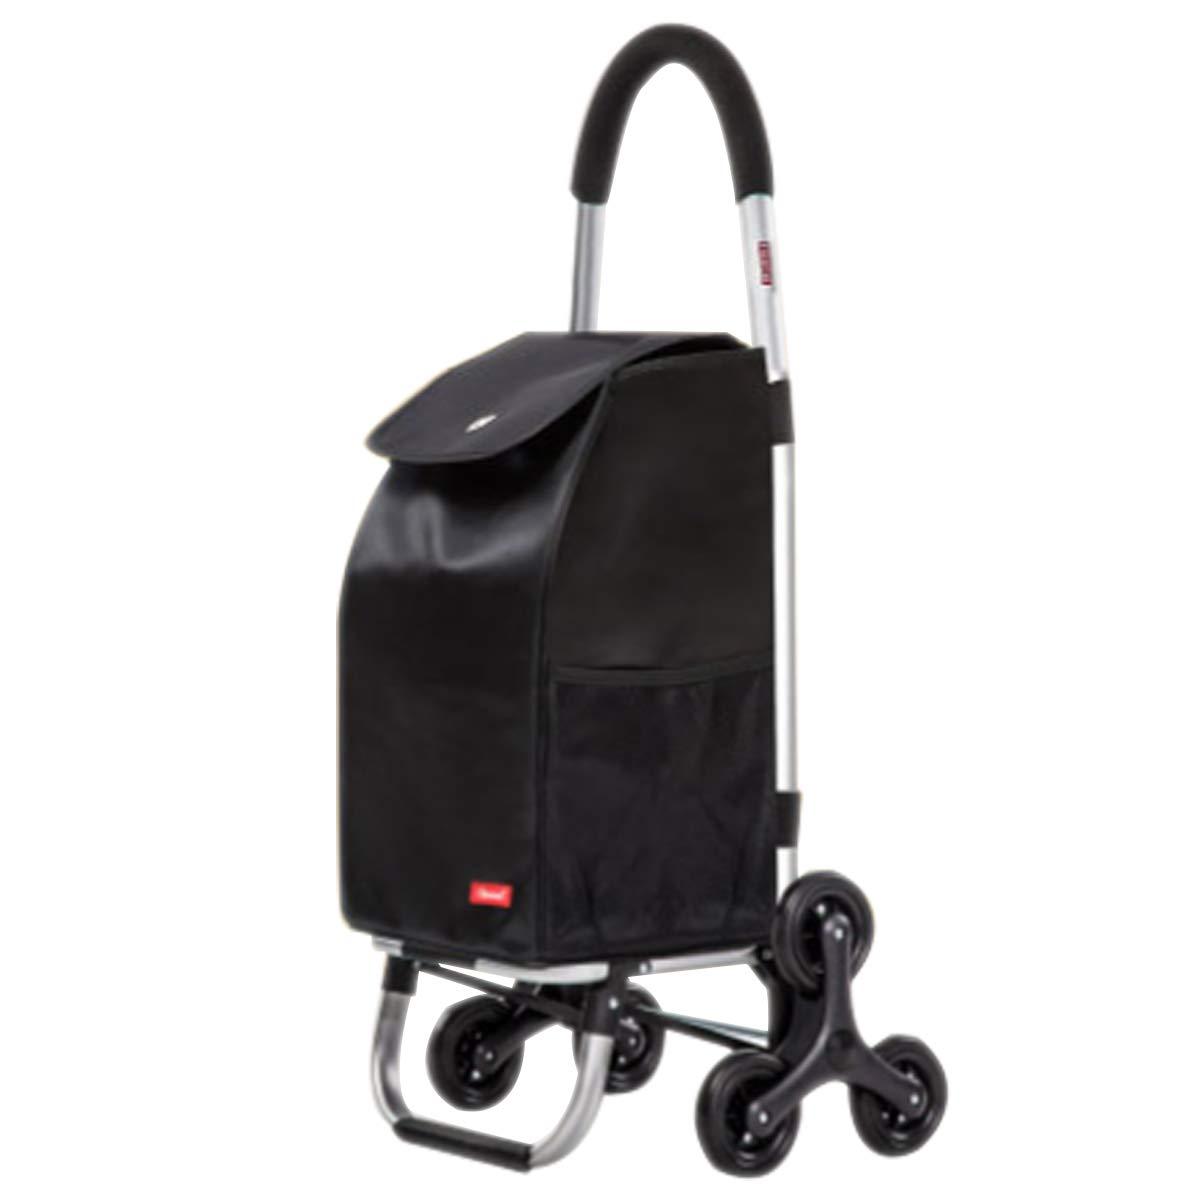 YGUOZ 大 折りたたみ ショッピングカート、2 輪、ショッピングキャリー、取り外し可能なバッグ、ショッピングキャリーカート 軽量(55L),black  black B07MV7V6PK